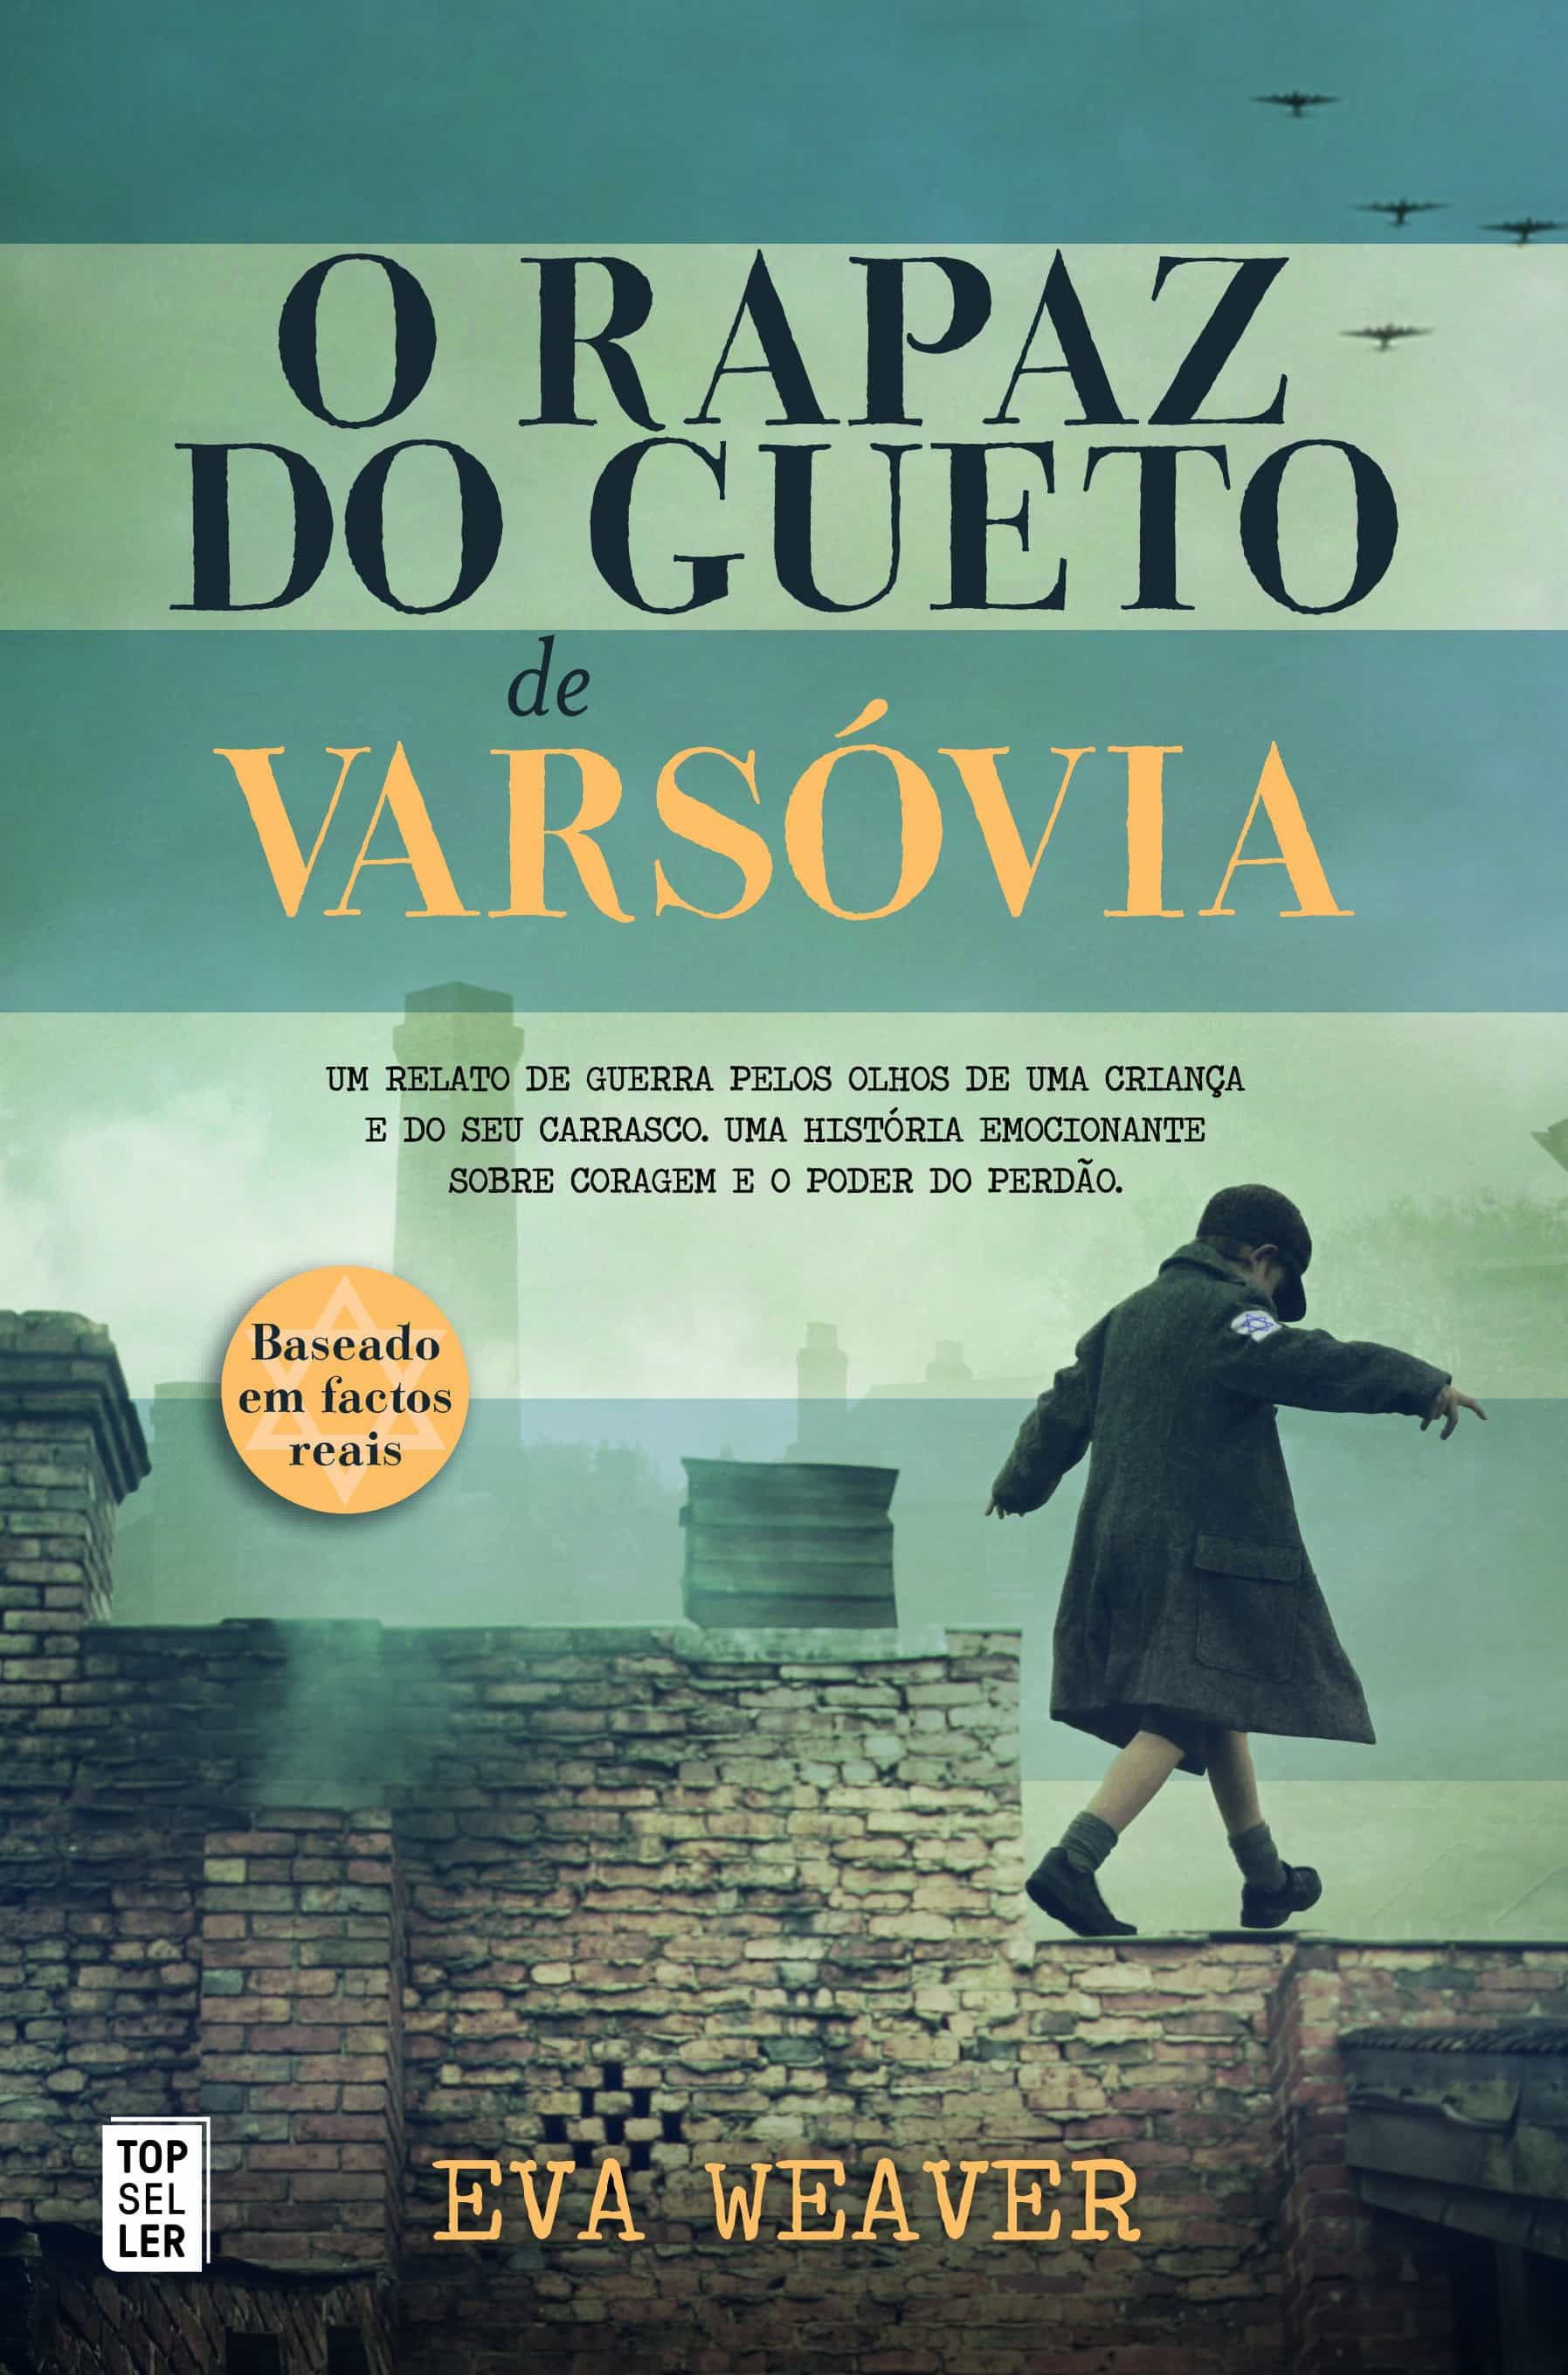 'O Rapaz do Gueto de Varsóvia', o judeu que tem que animar os nazis